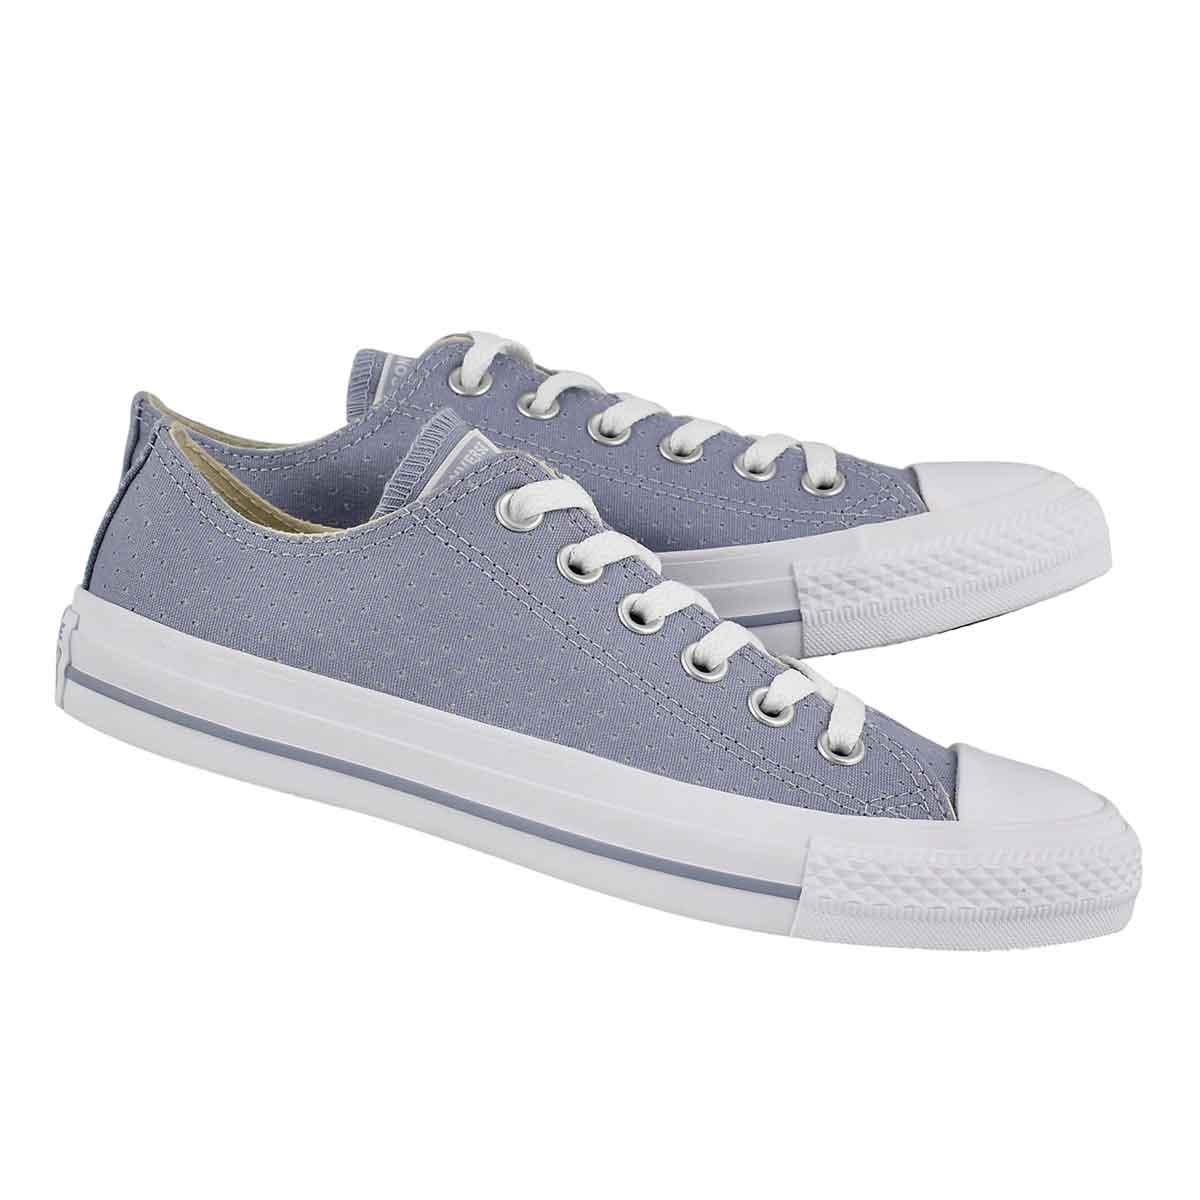 Lds CT A/S Seasonal glacier grey sneaker